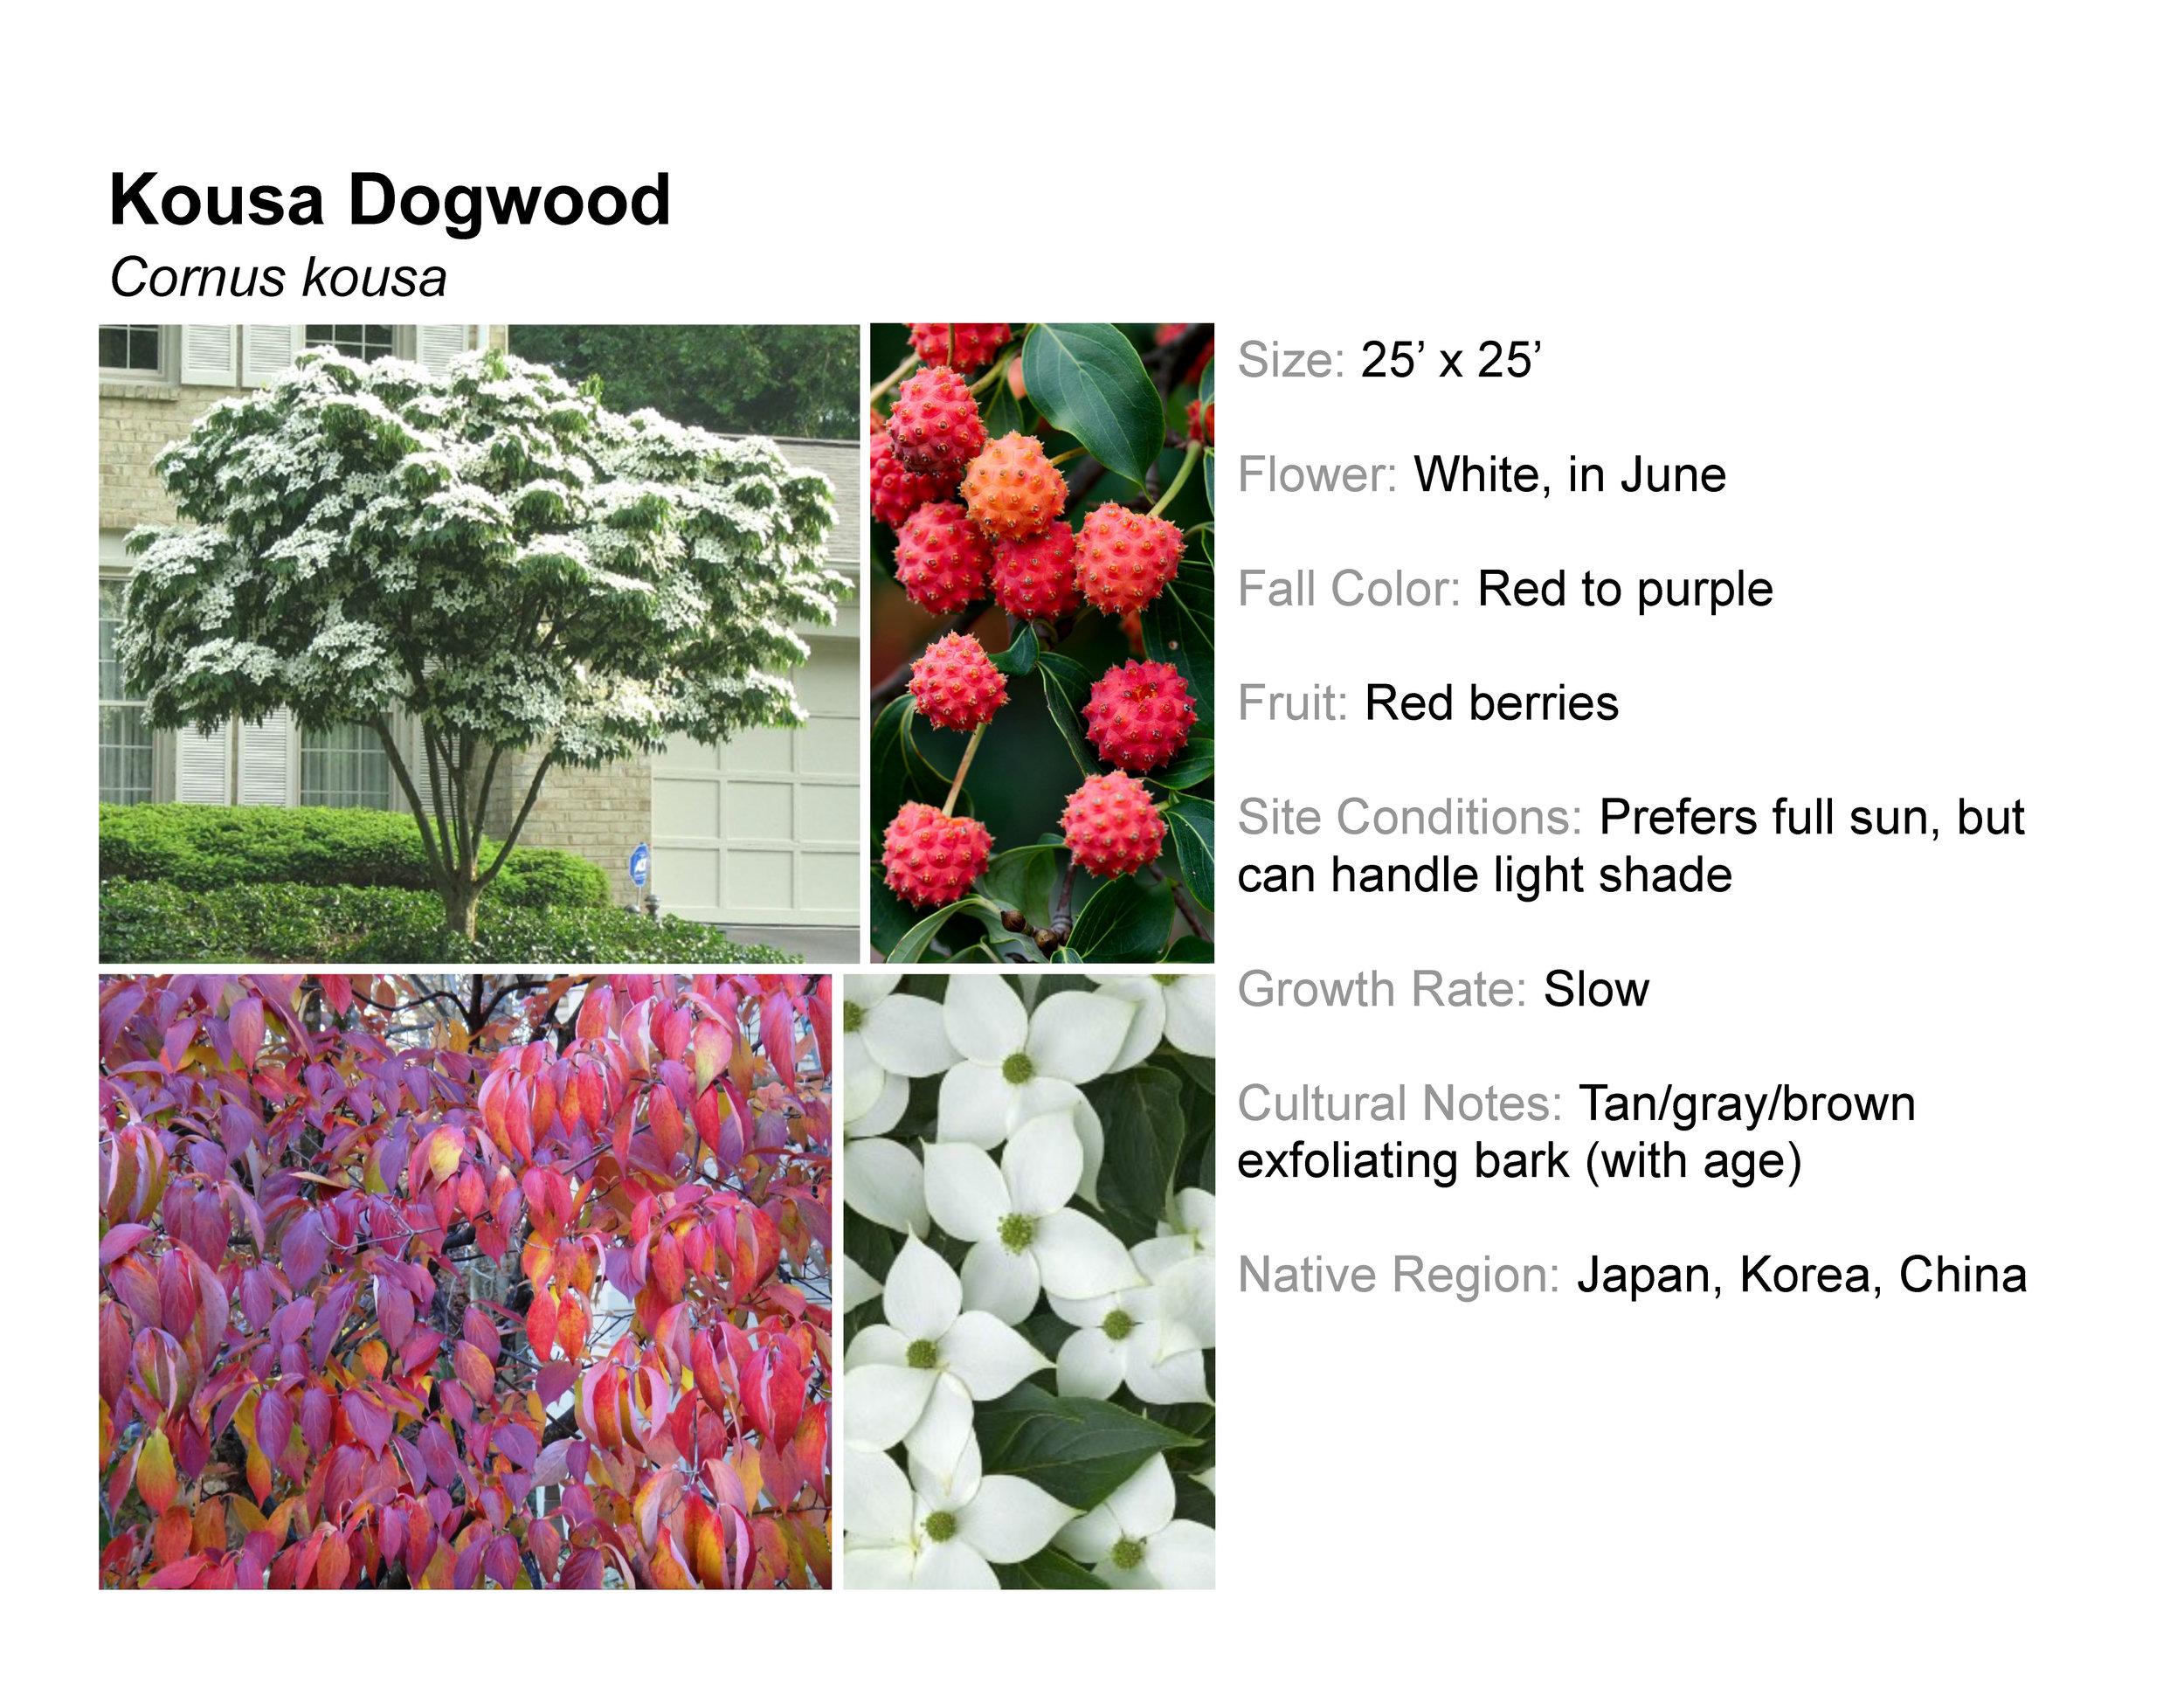 Kousa Dogwood